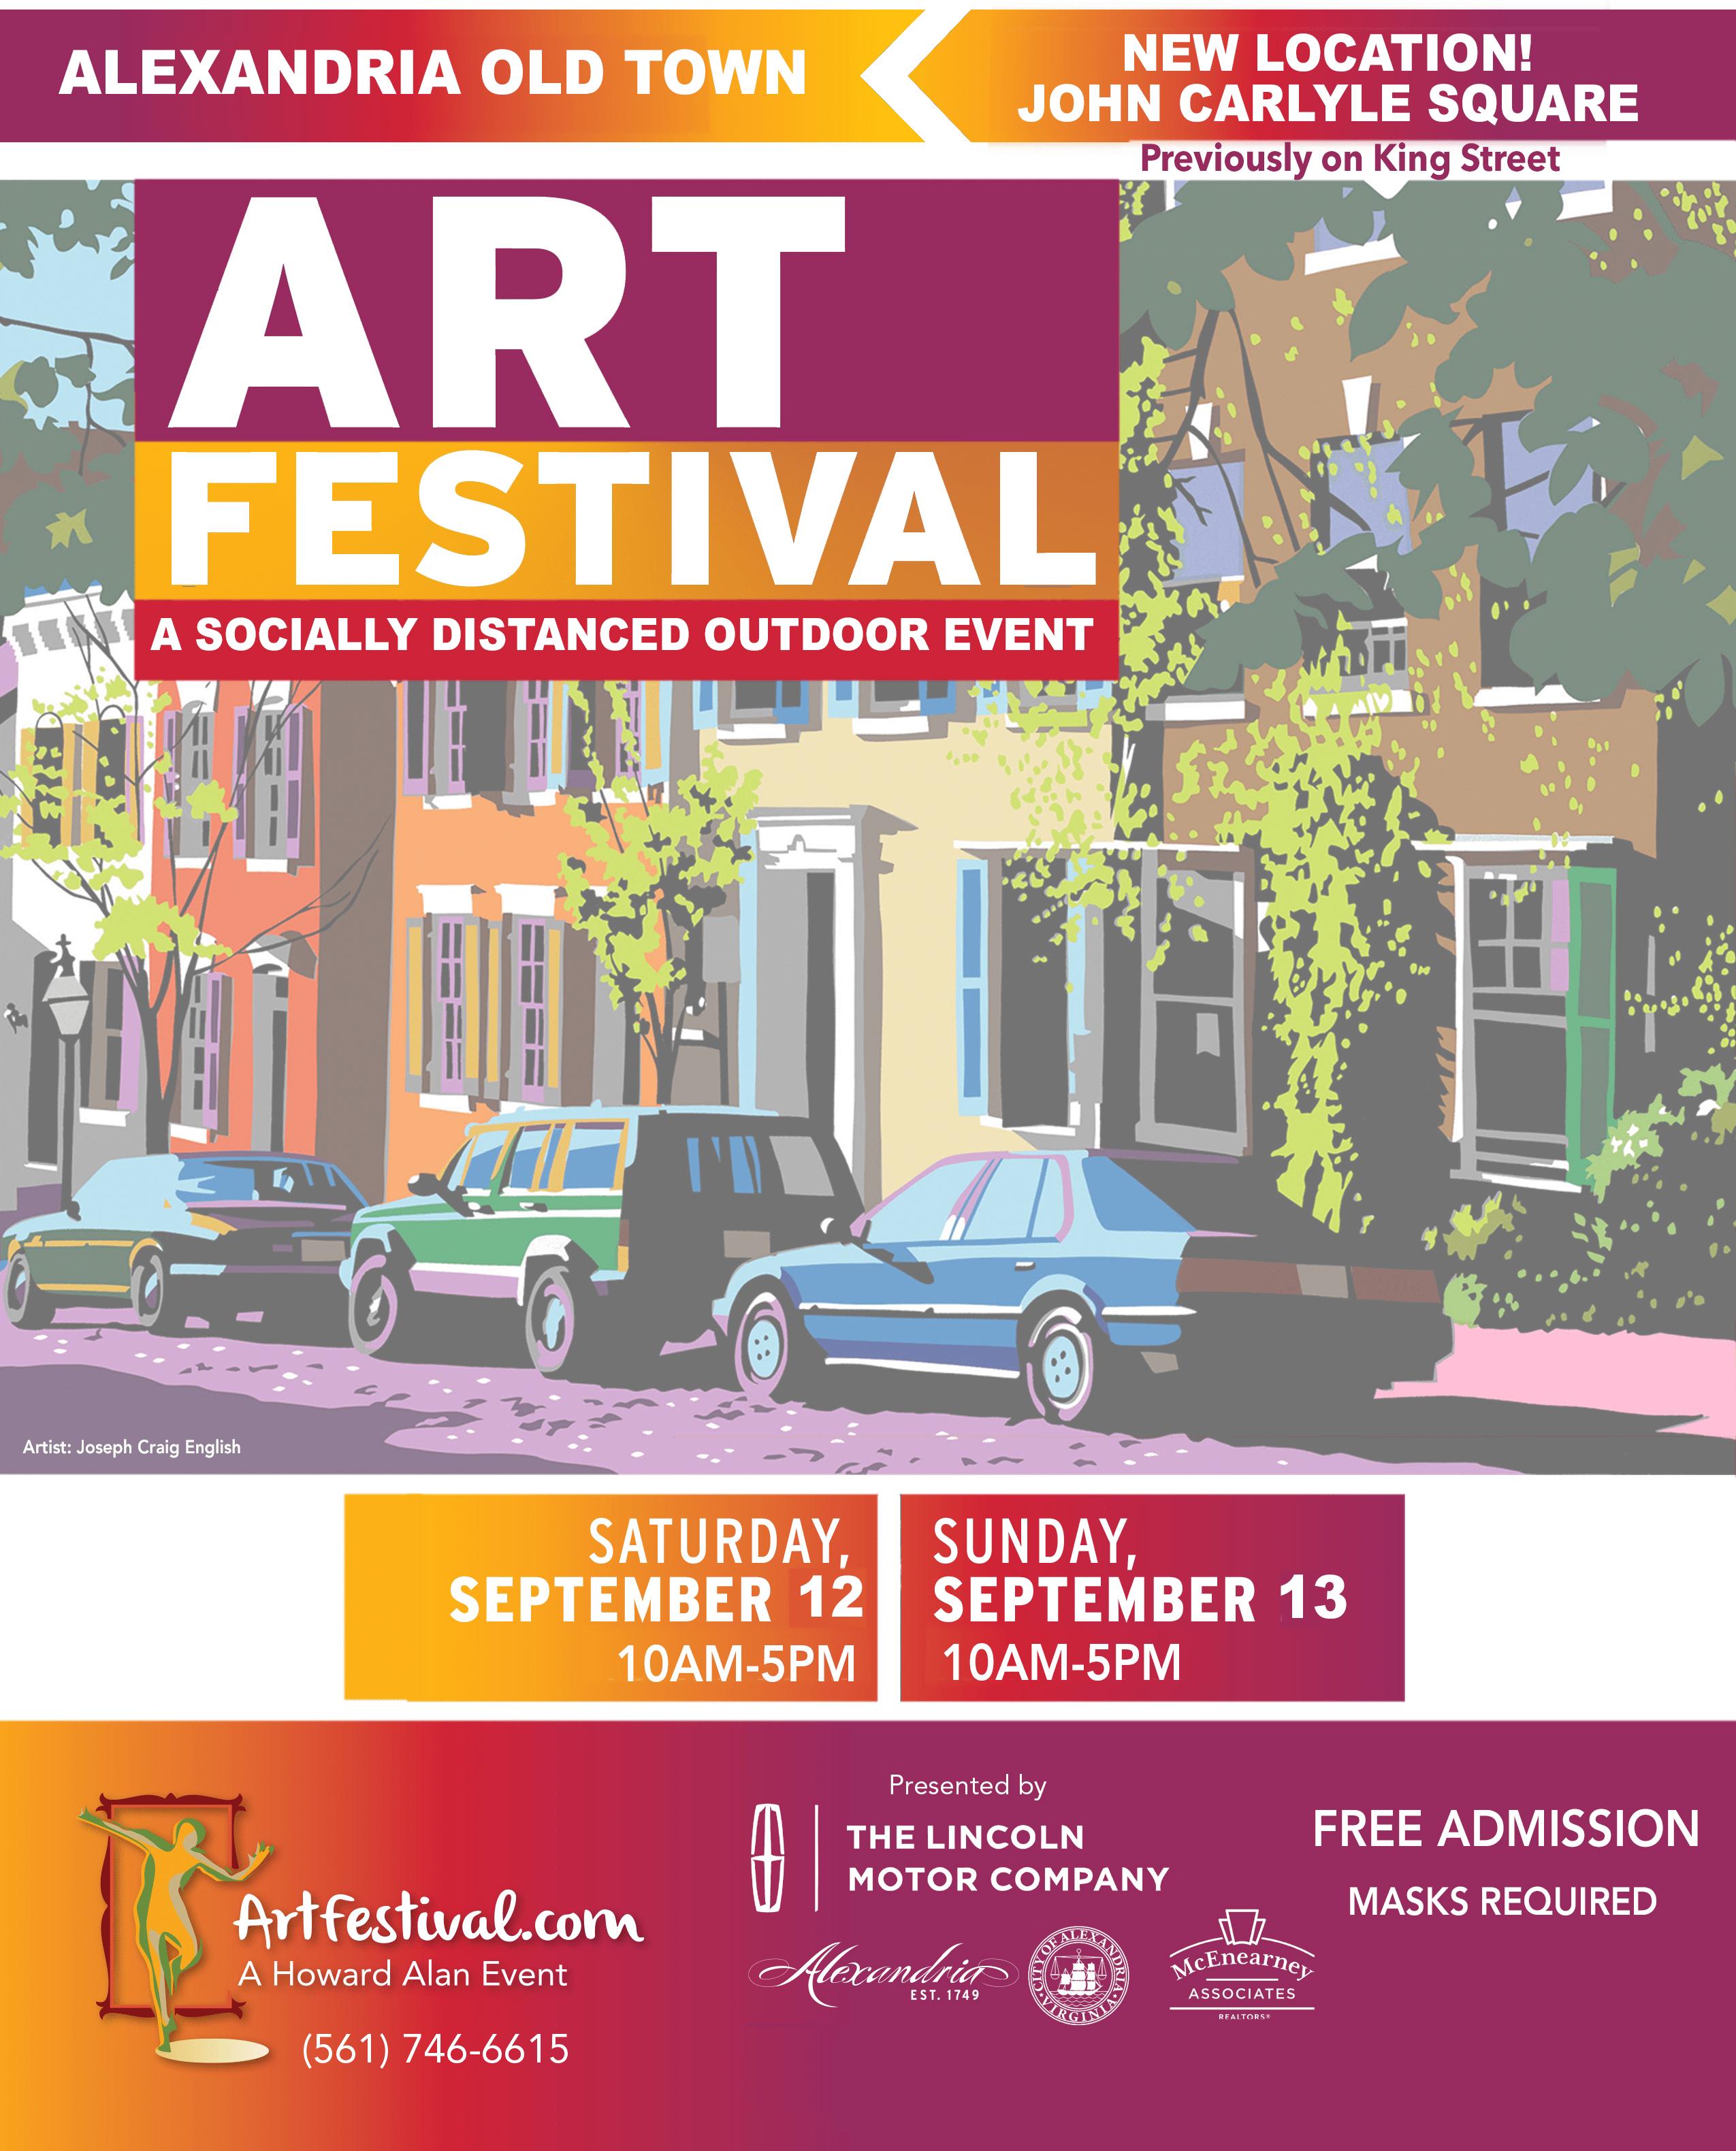 18th Annual Alexandria Old Town Art Festival